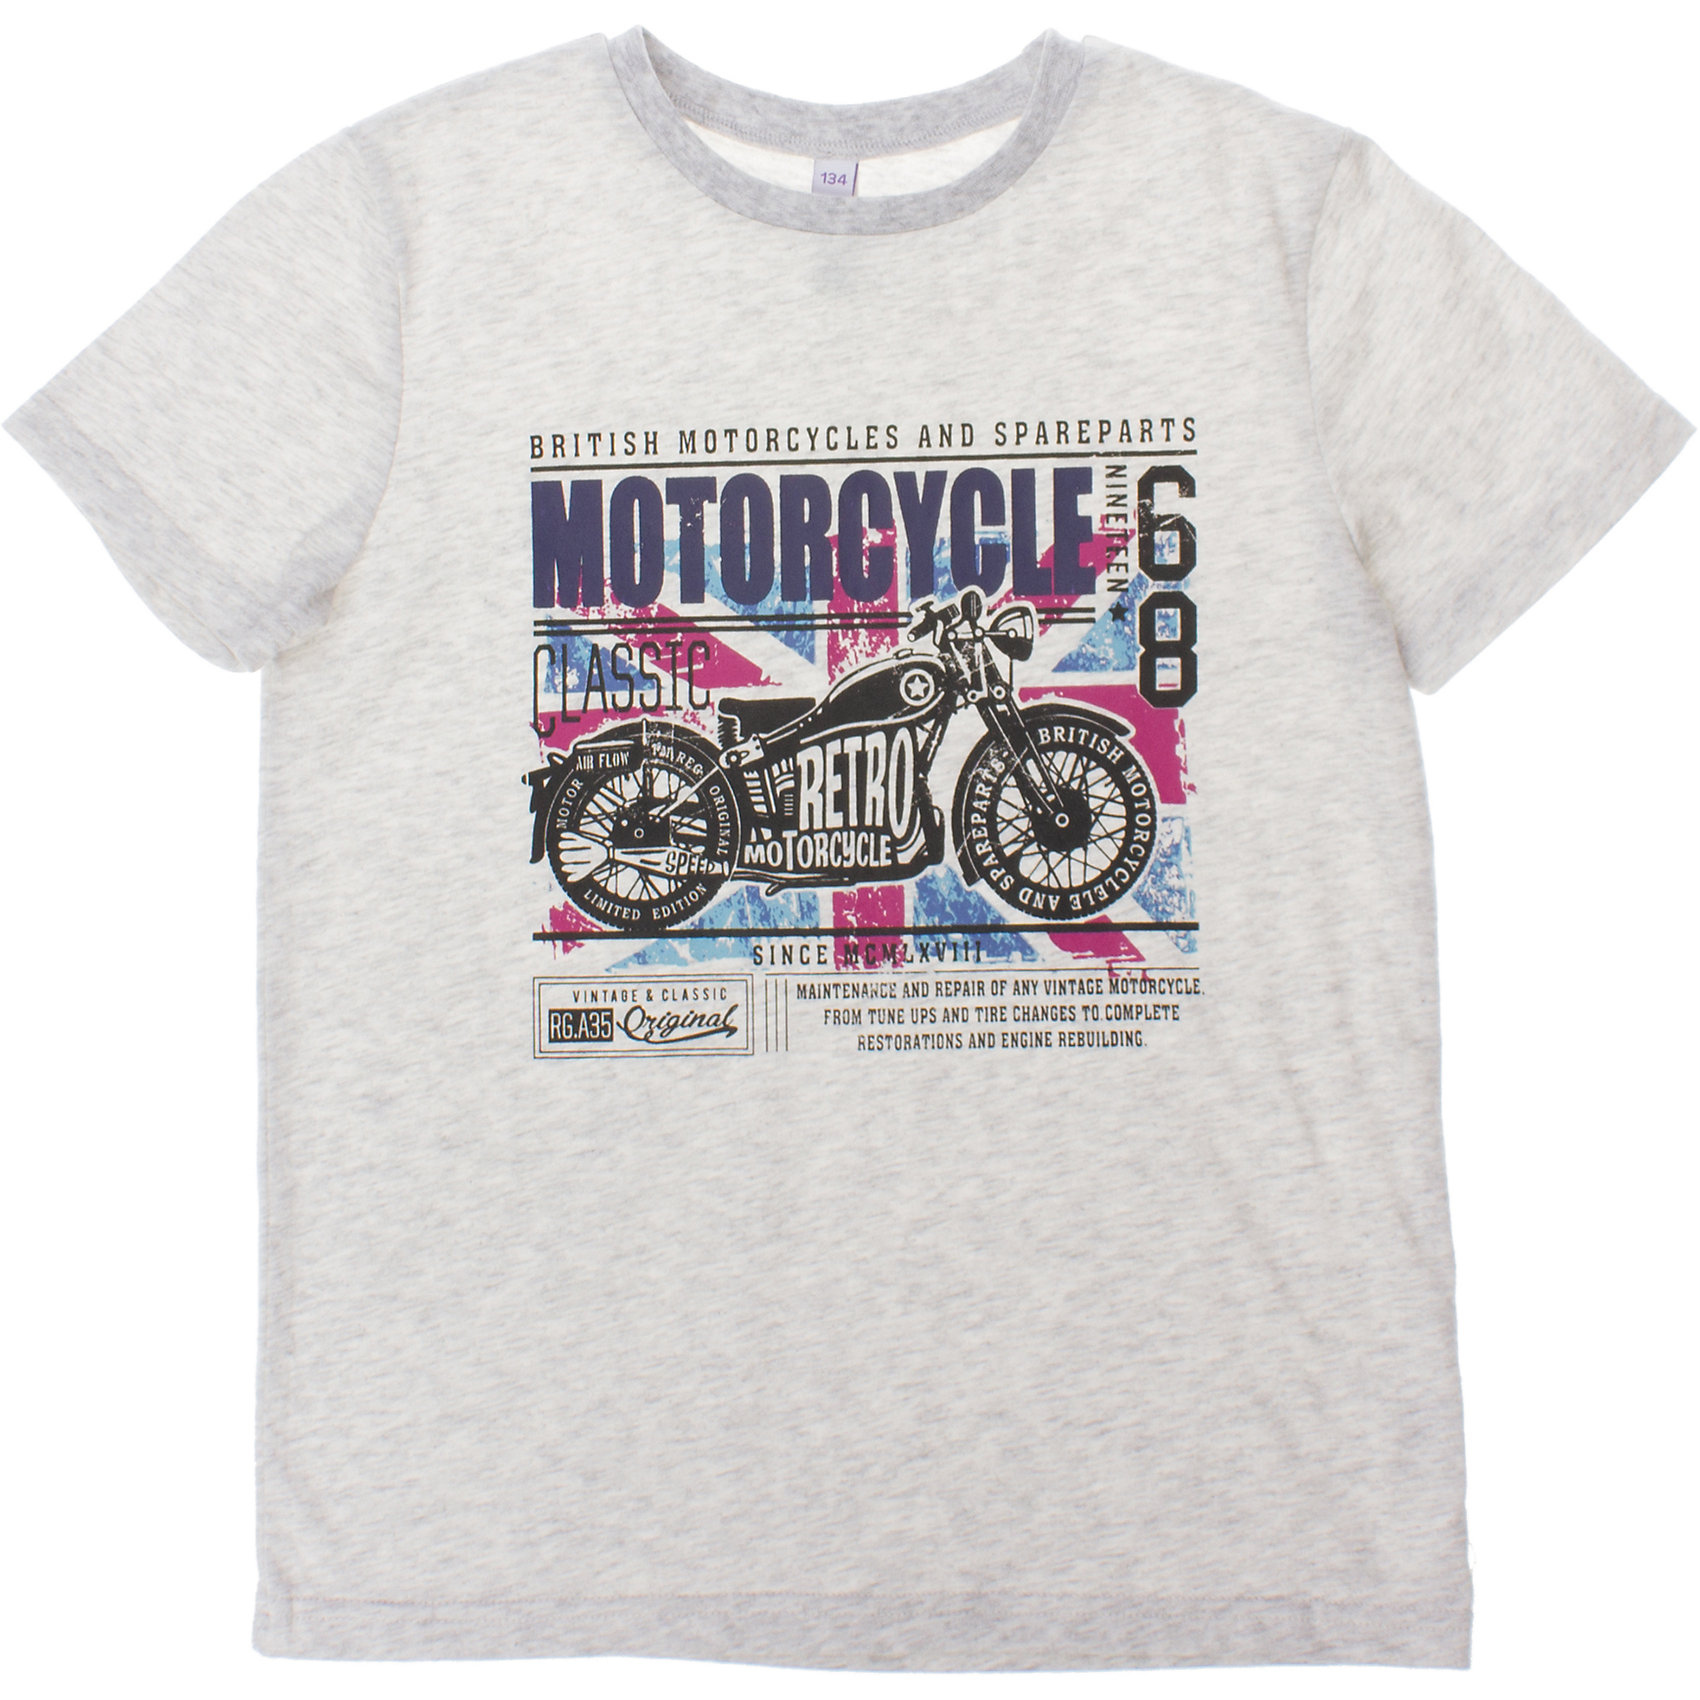 S'cool Футболка для мальчика S'cool trybeyond футболка для мальчика 999 74498 00 40z серый trybeyond